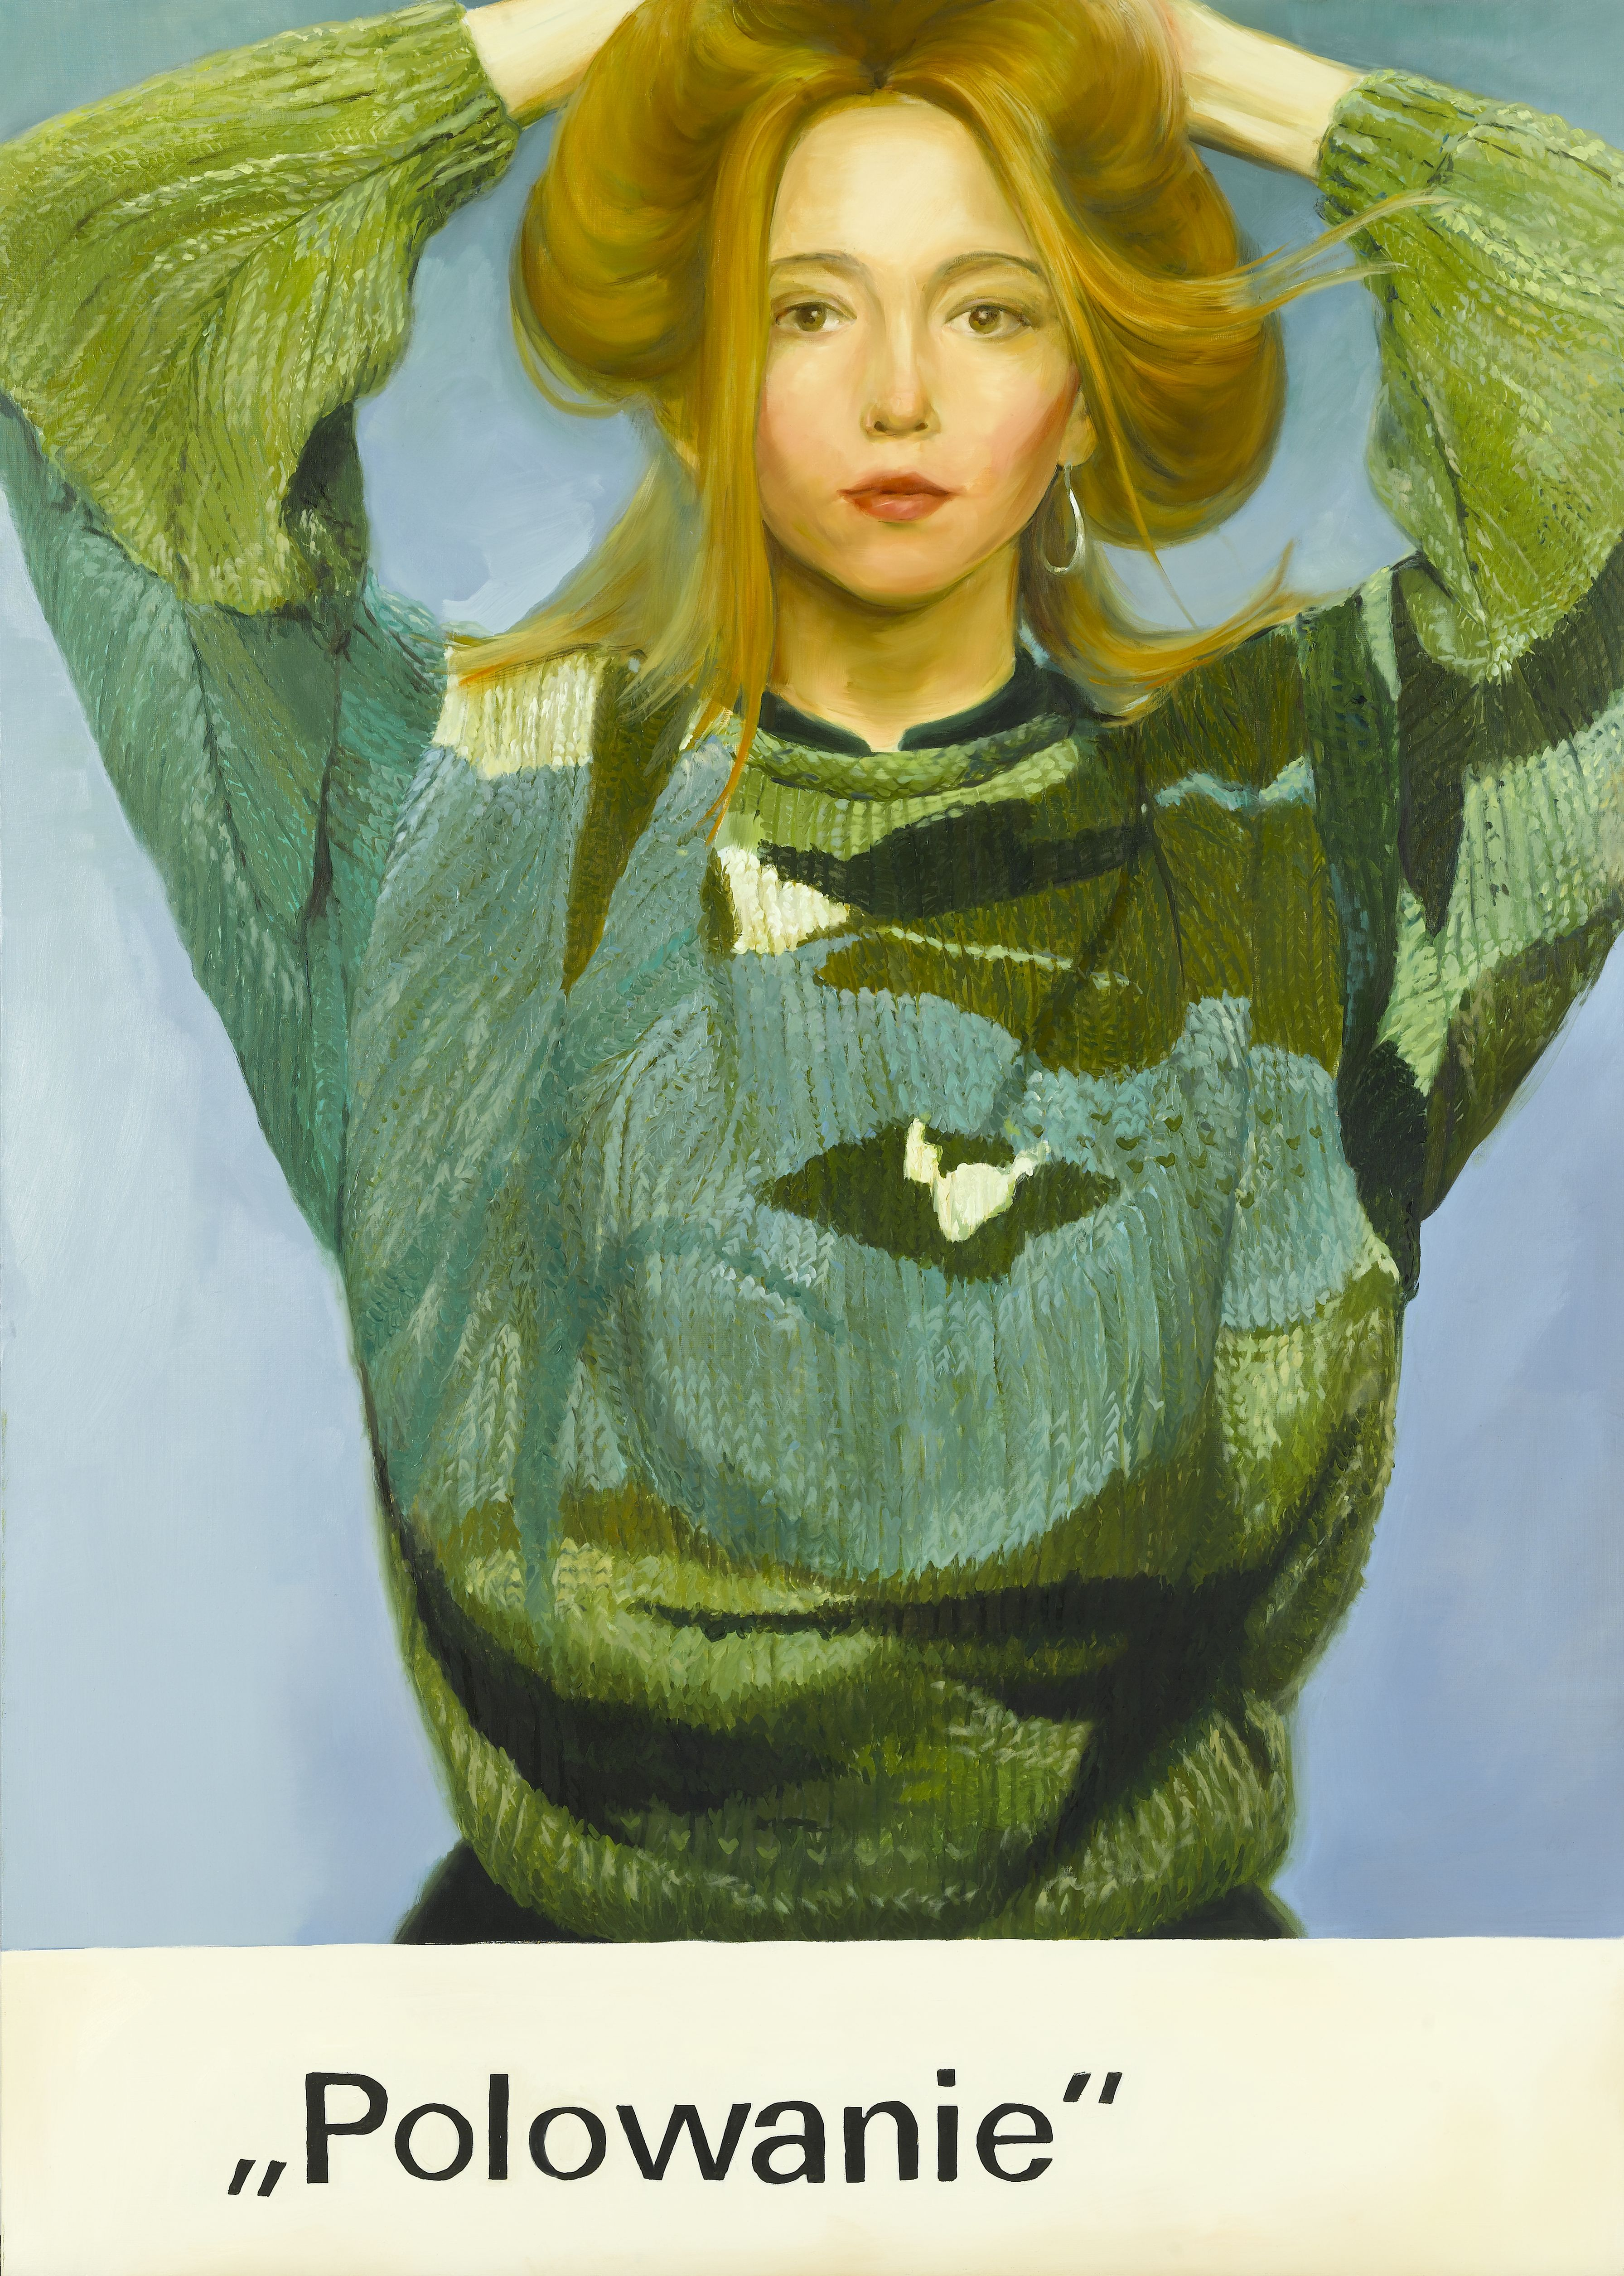 Paulina Ołowska, Hunting, 2010. Collectie Stedelijk Museum Amsterdam_original